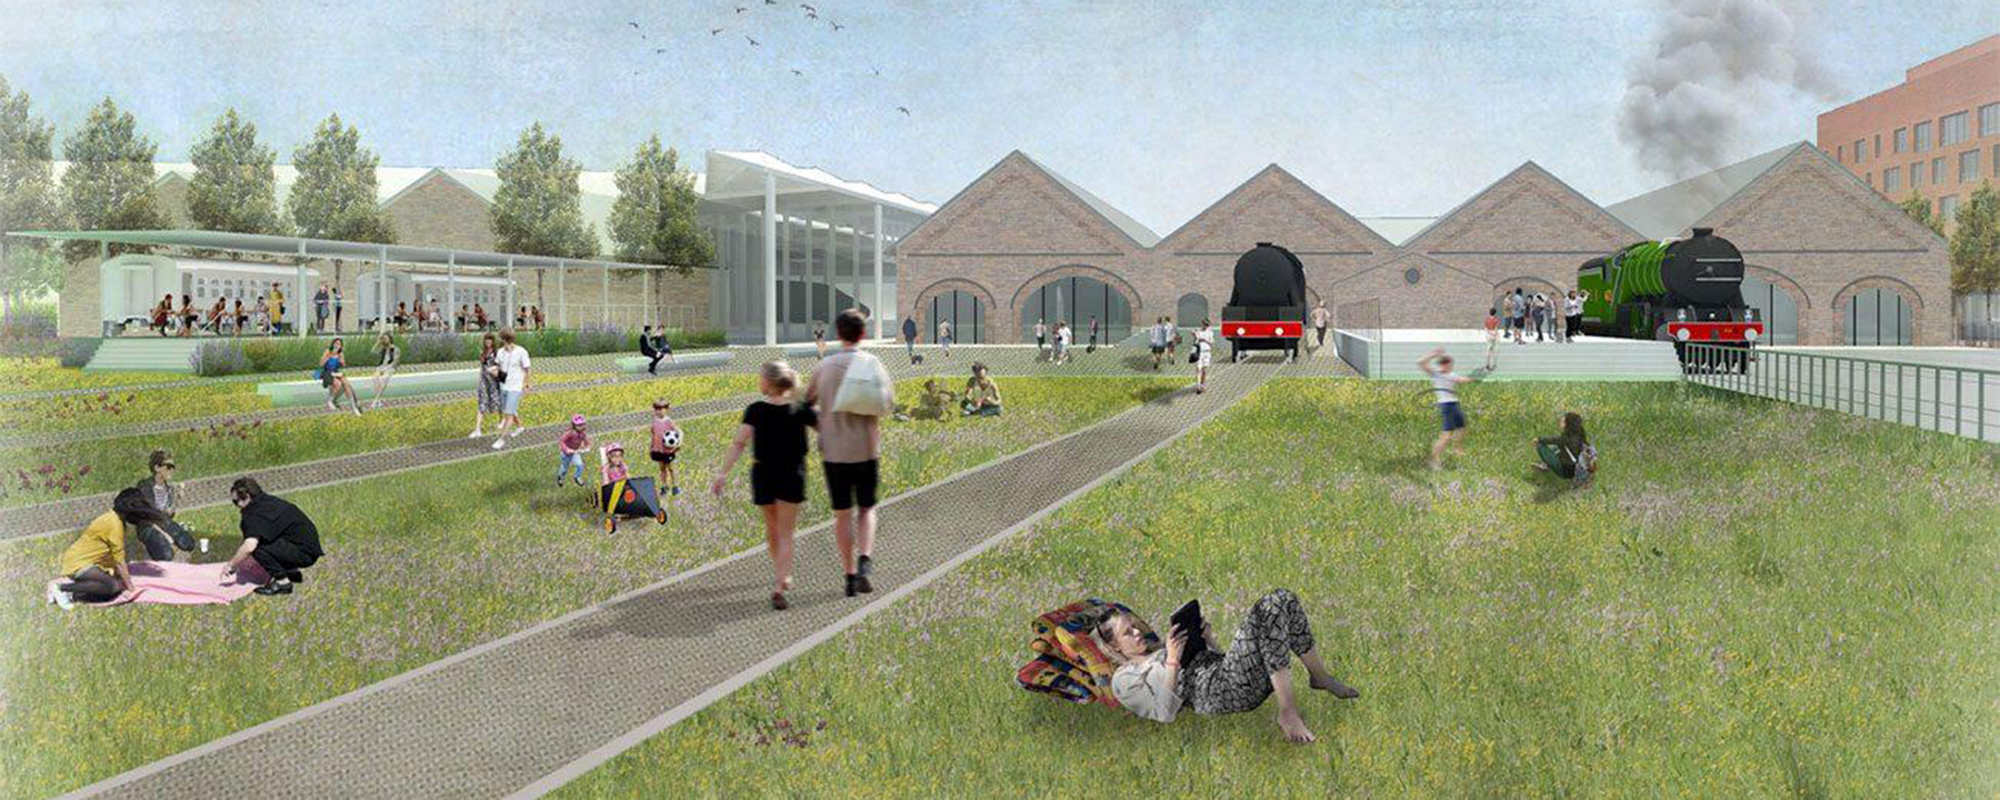 Vision for York 2025